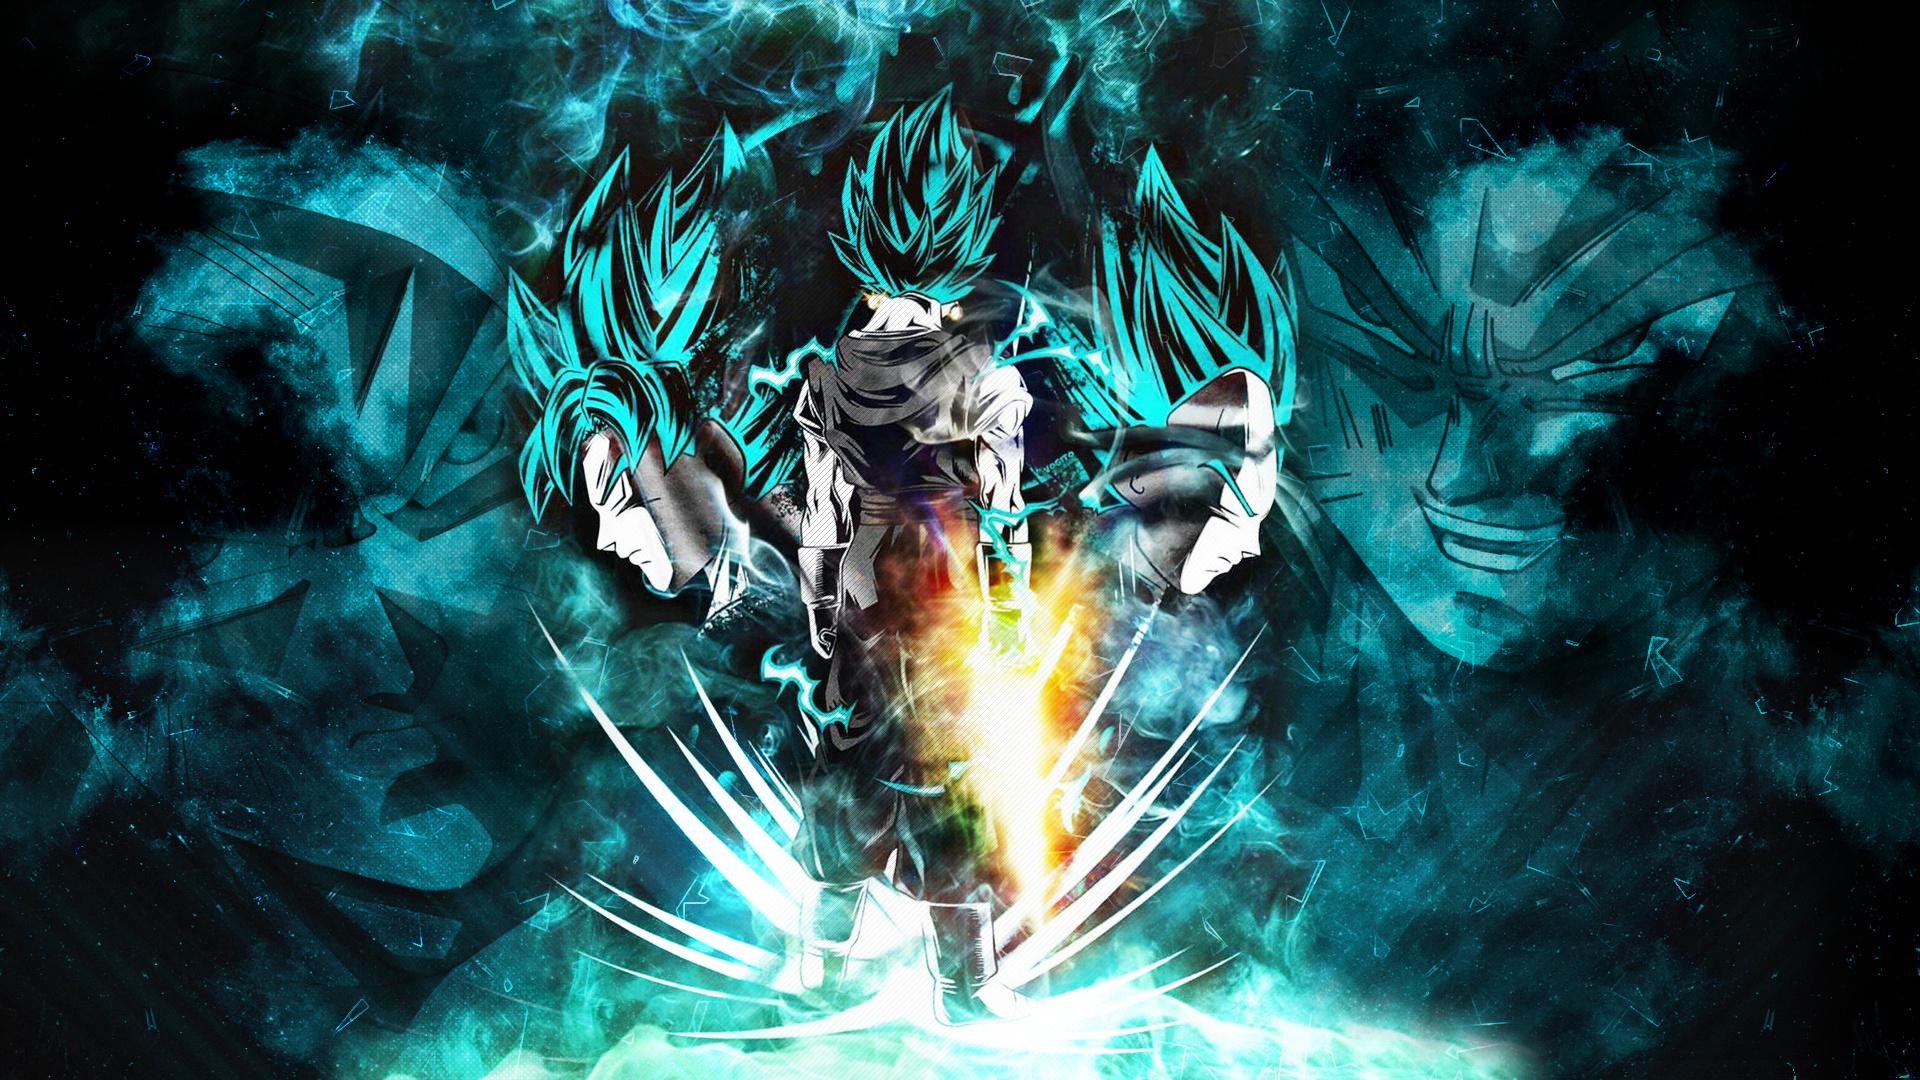 Download 1920x1080 Wallpaper Vegeta Dragon Ball Artwork